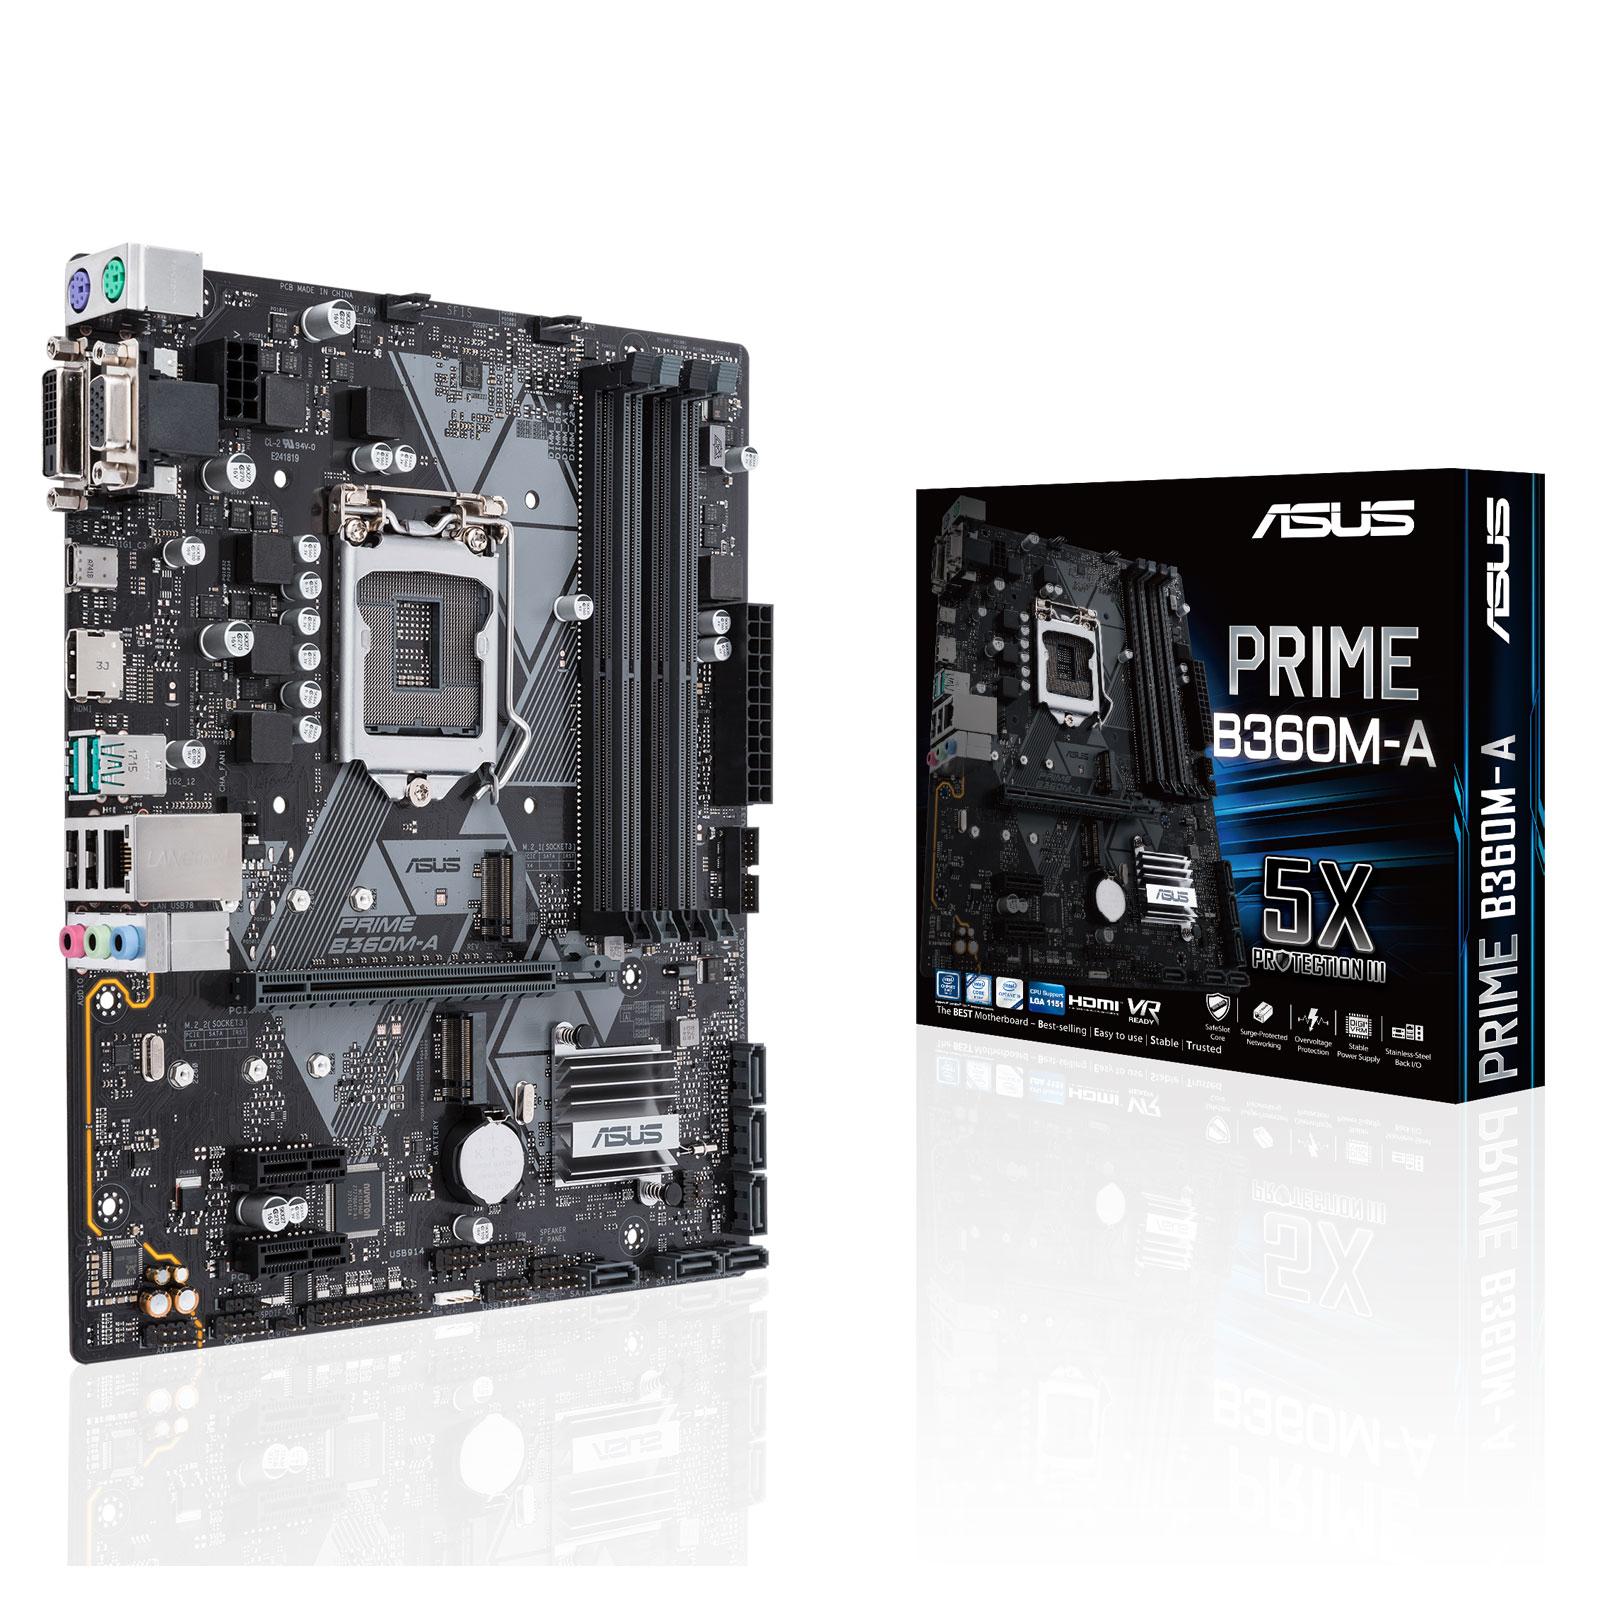 Carte mère ASUS PRIME B360M-A Carte mère Micro ATX Socket 1151 Intel B360 Express - 4x DDR4 - SATA 6Gb/s + M.2 - USB 3.1 - 1x PCI-Express 3.0 16x